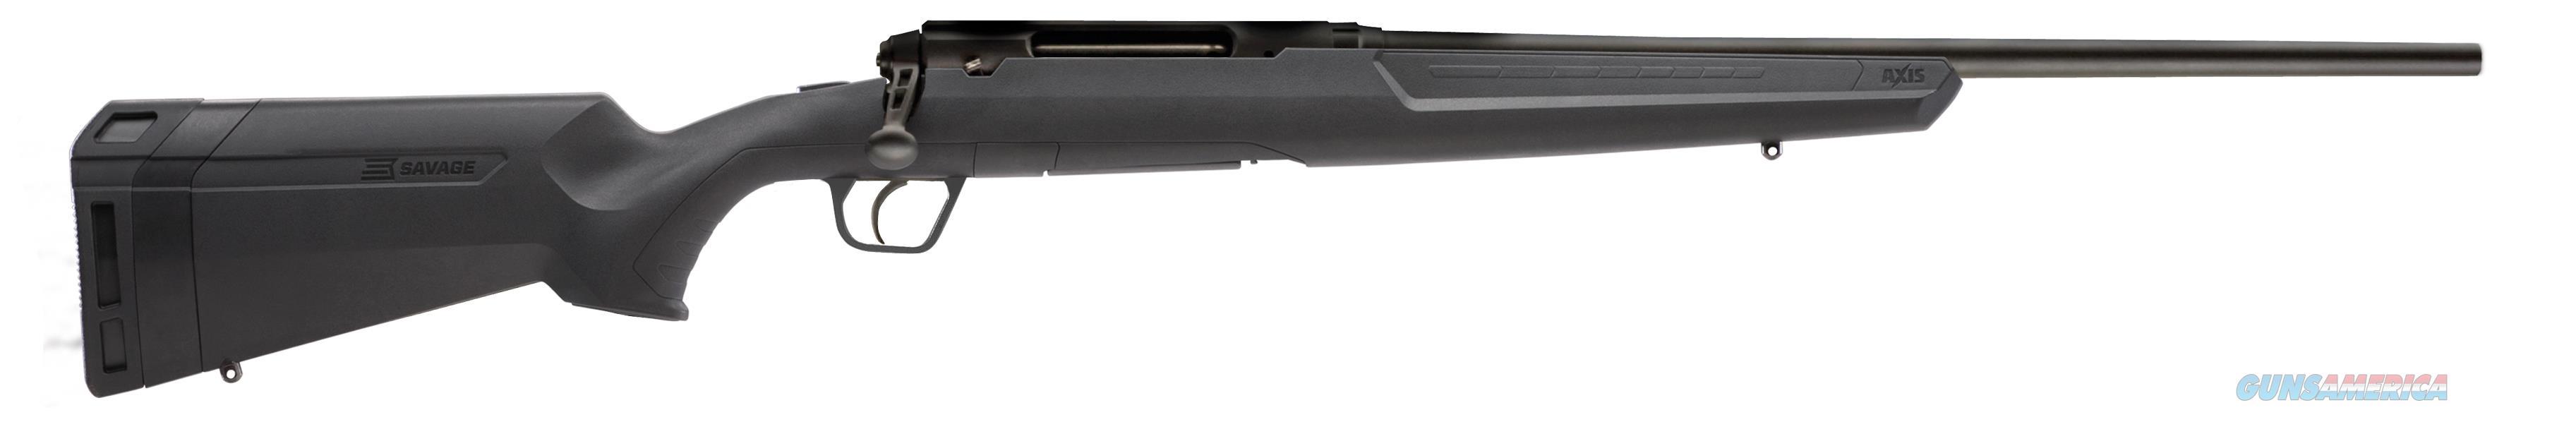 "Axis G2 Cmpct 223Rem Bl/Sy 20"" 57244  Guns > Rifles > S Misc Rifles"